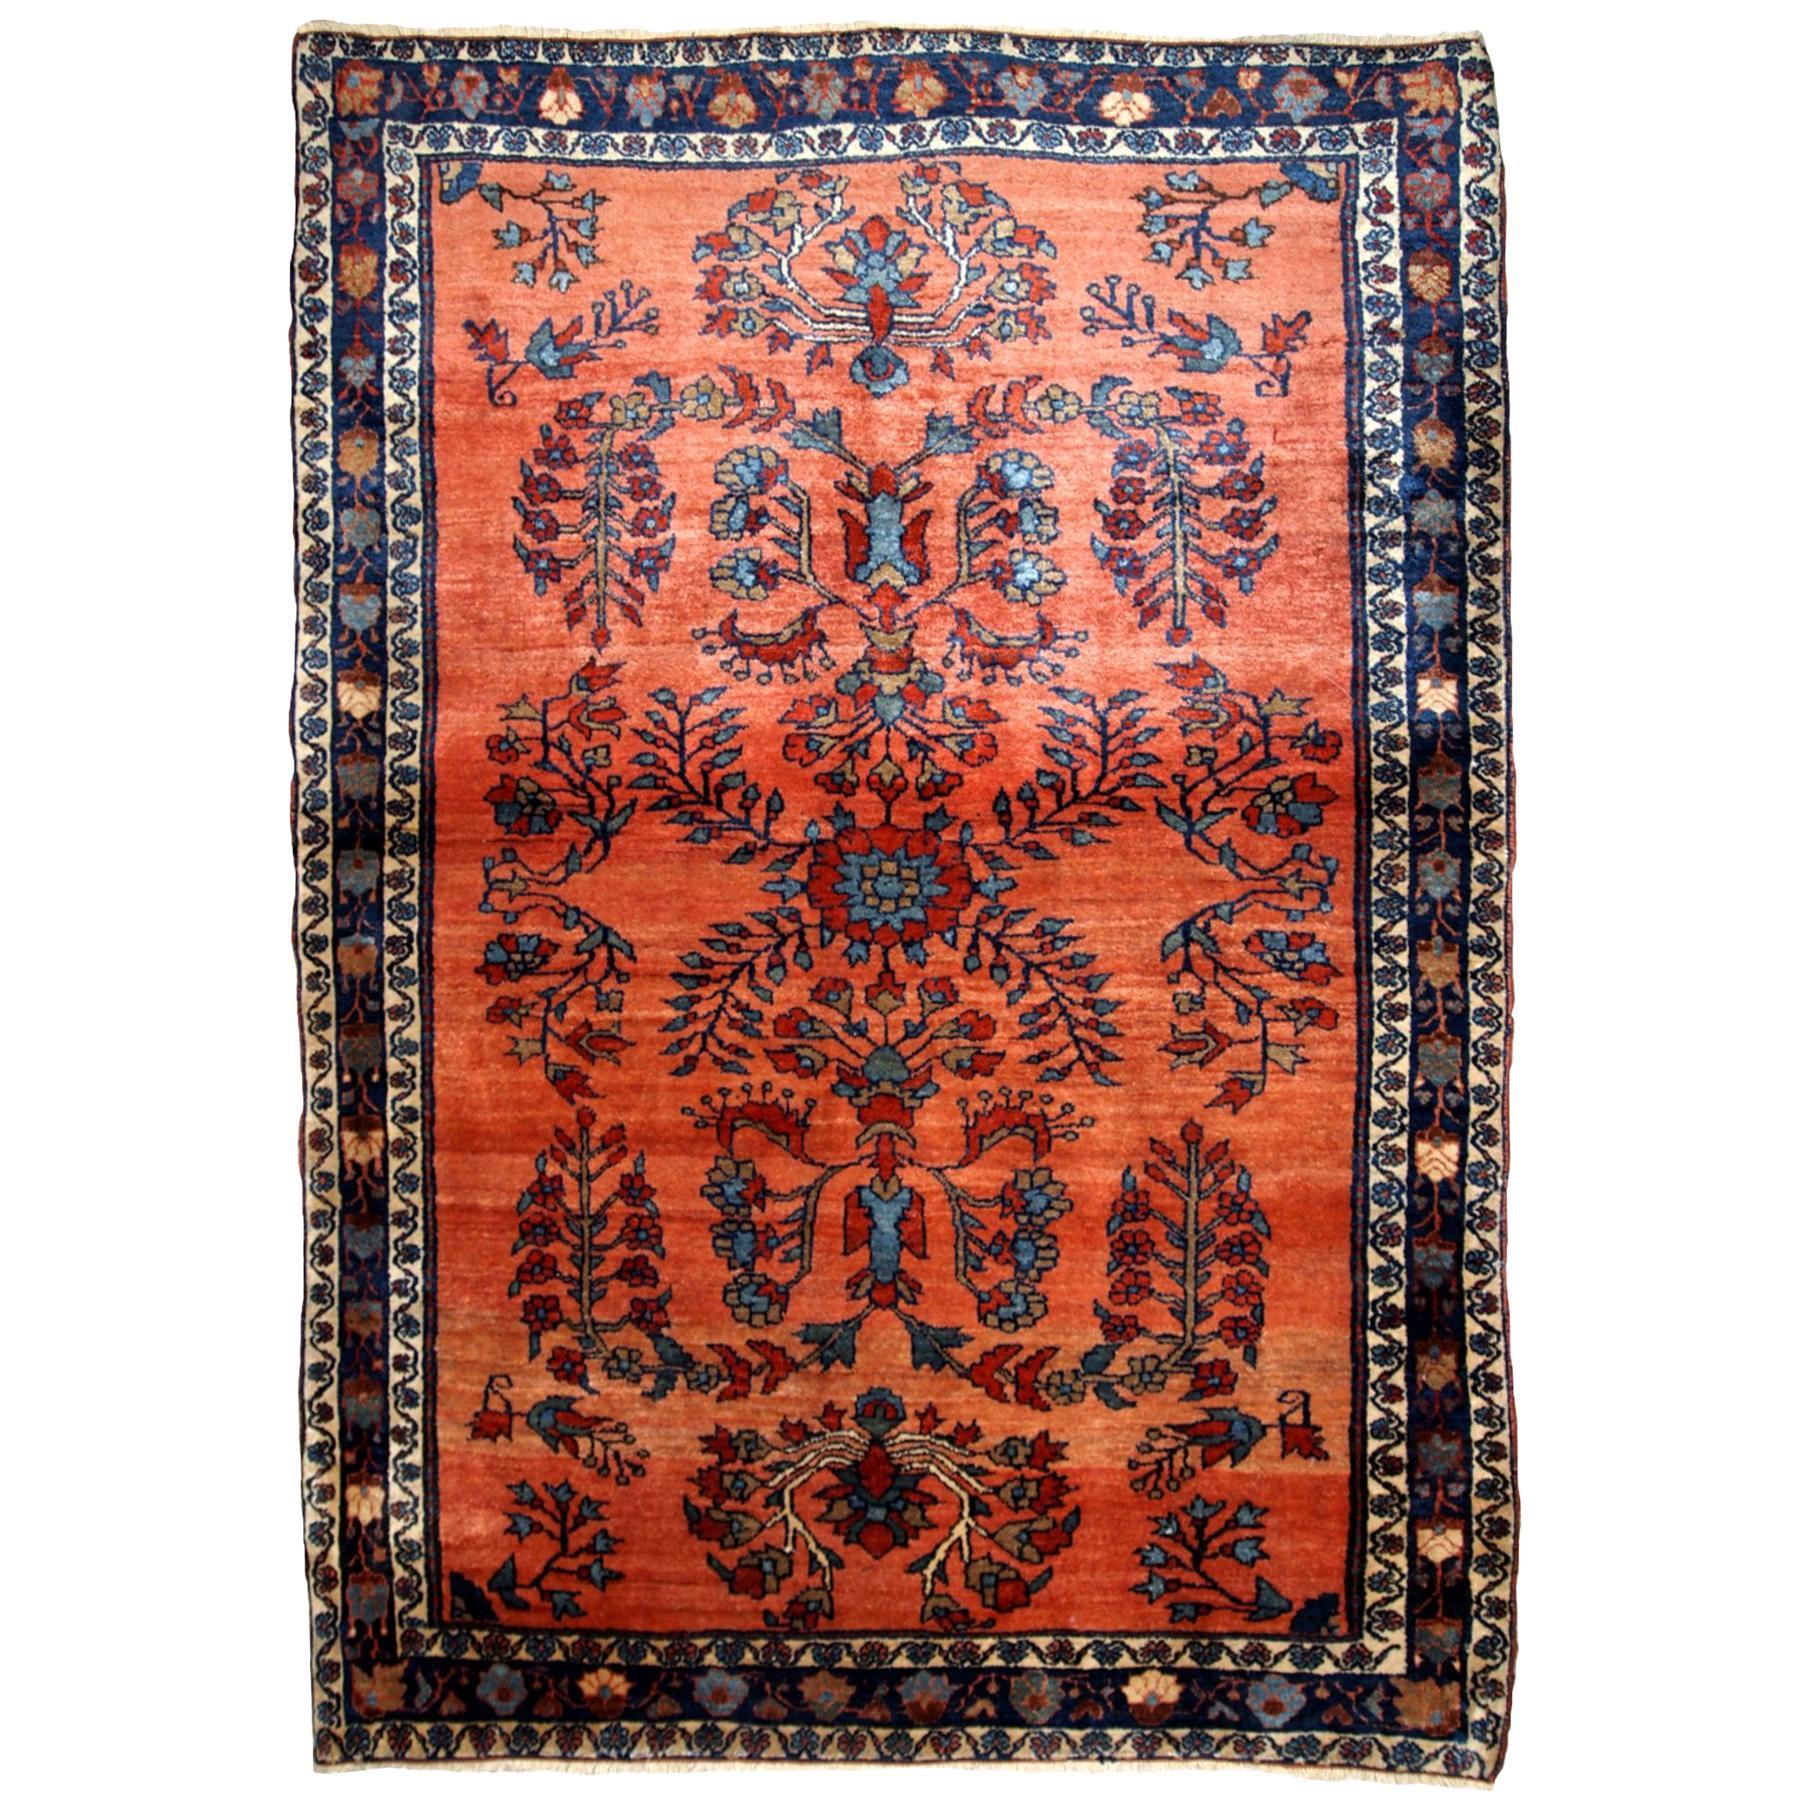 Handmade Antique Sarouk Style Rug, 1900s, 1B694